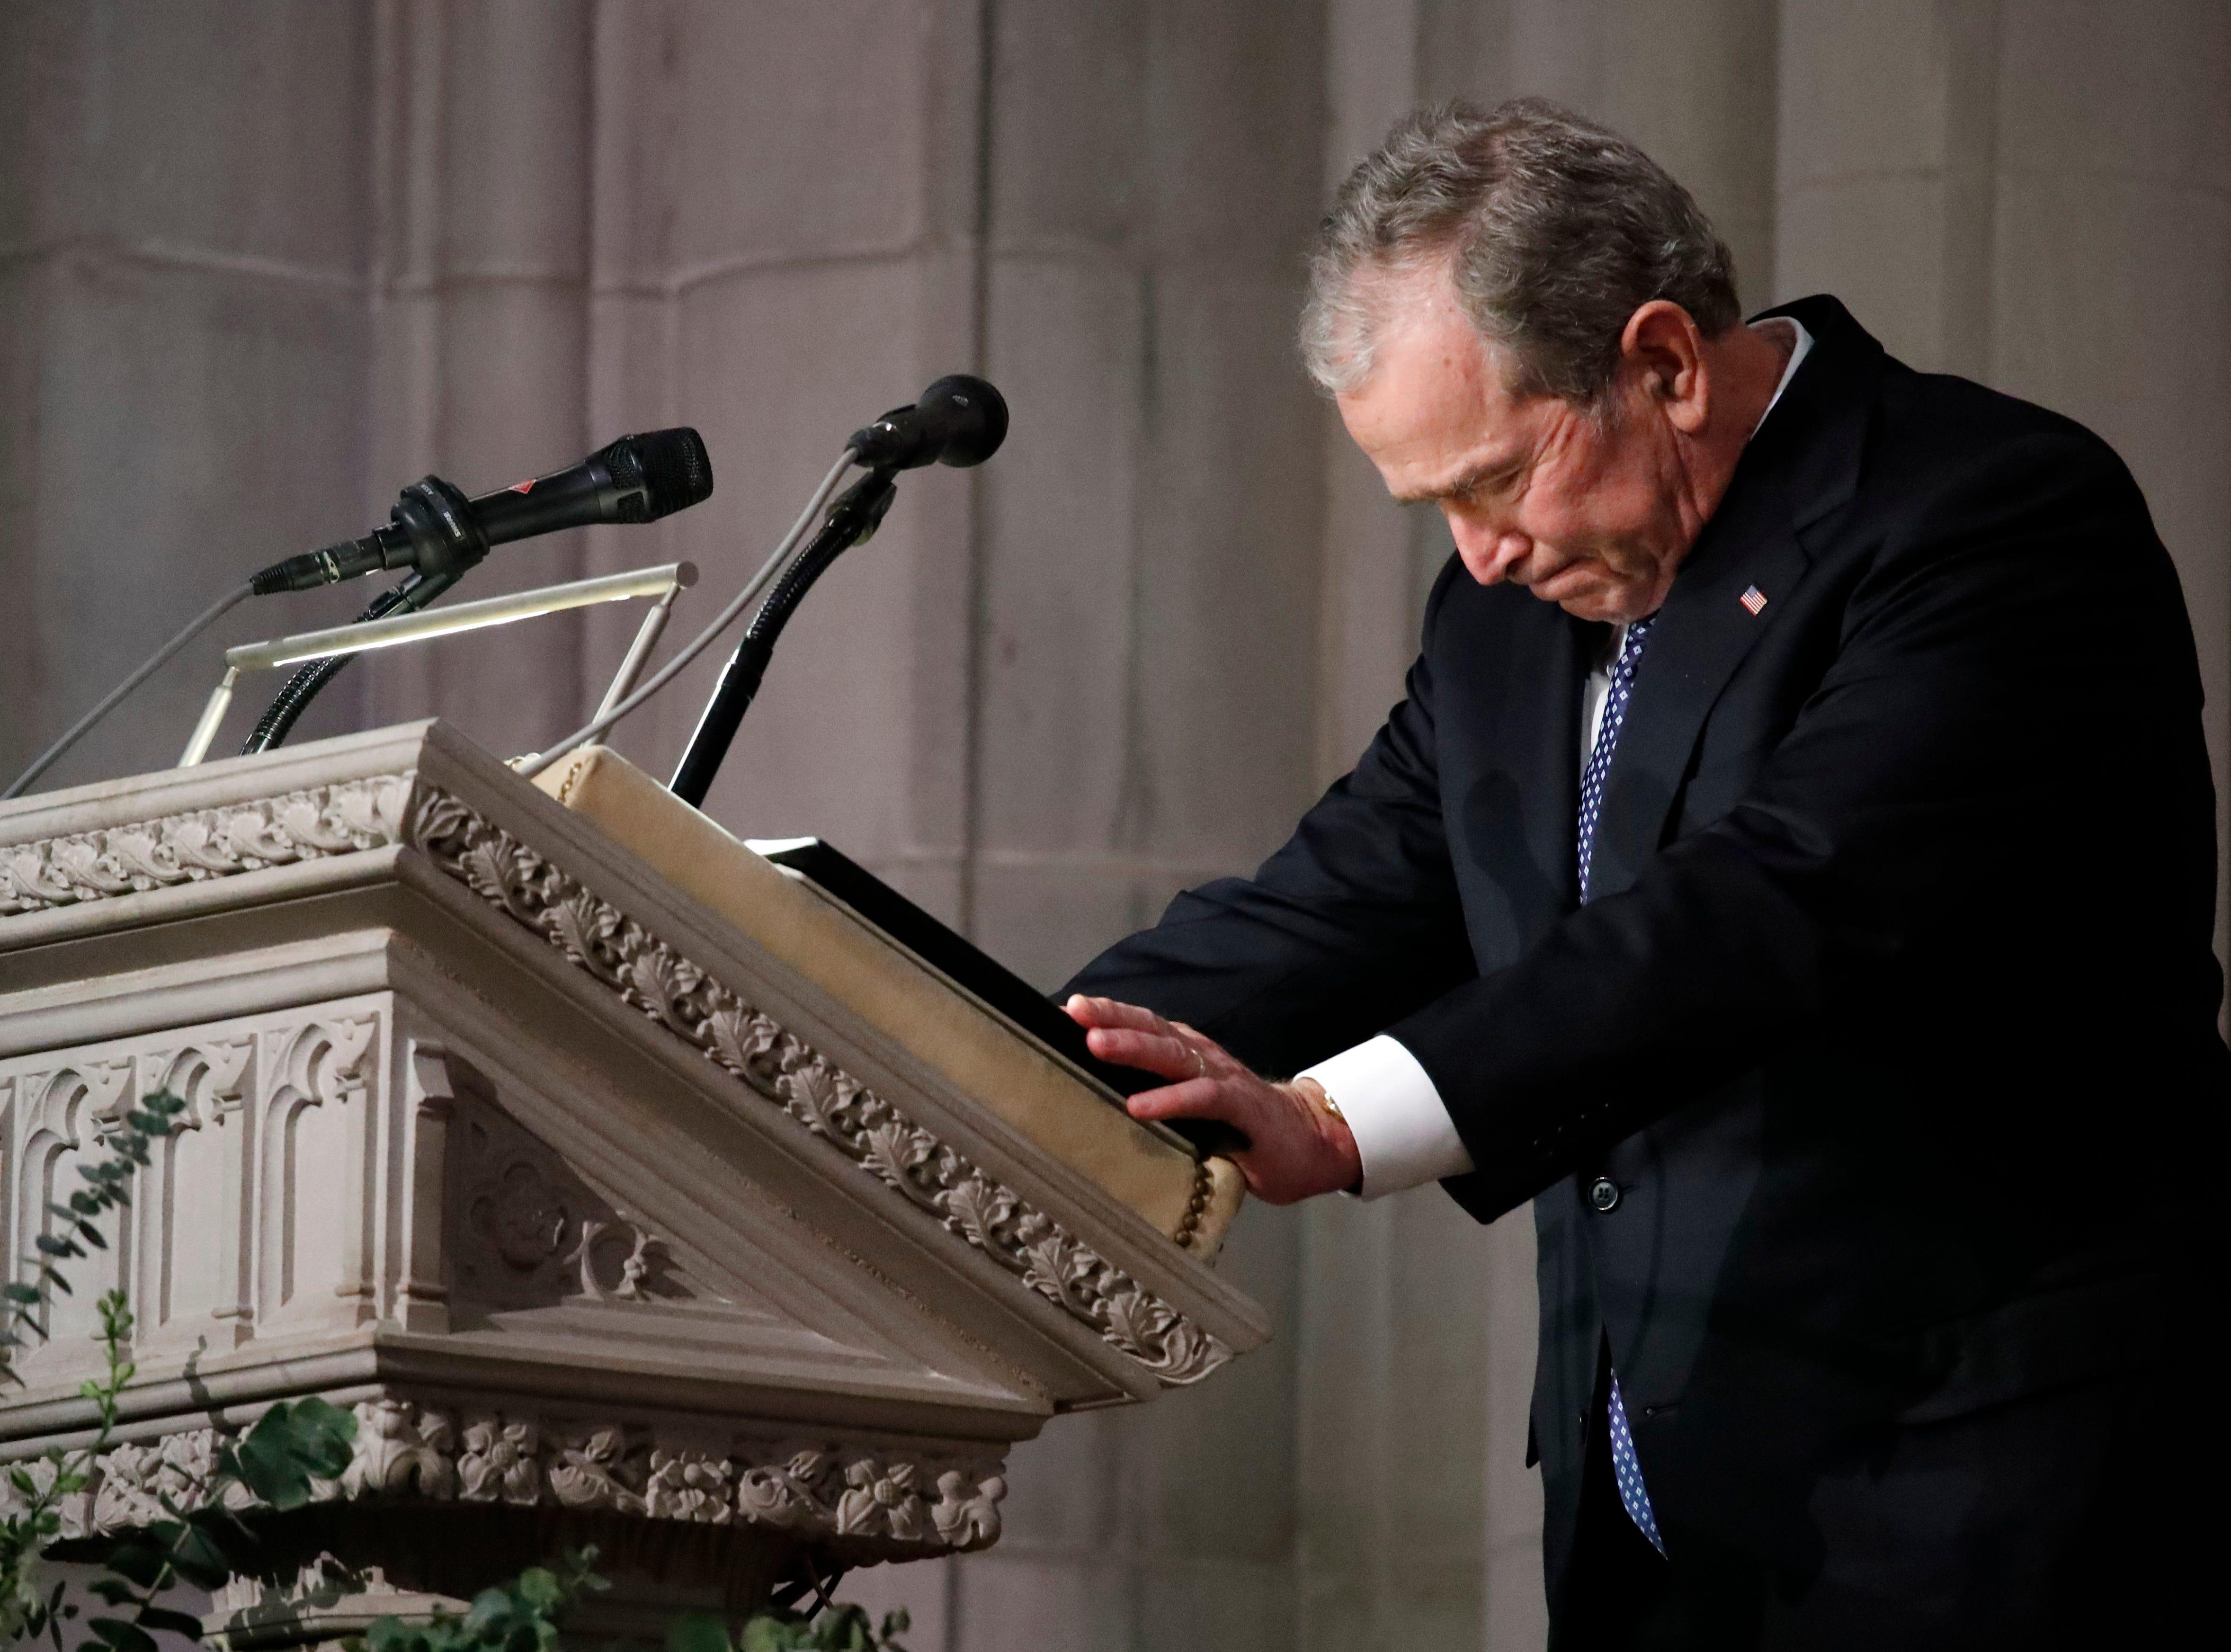 Mitch Albom: George W. Bush's farewell to dad is sadly familiar